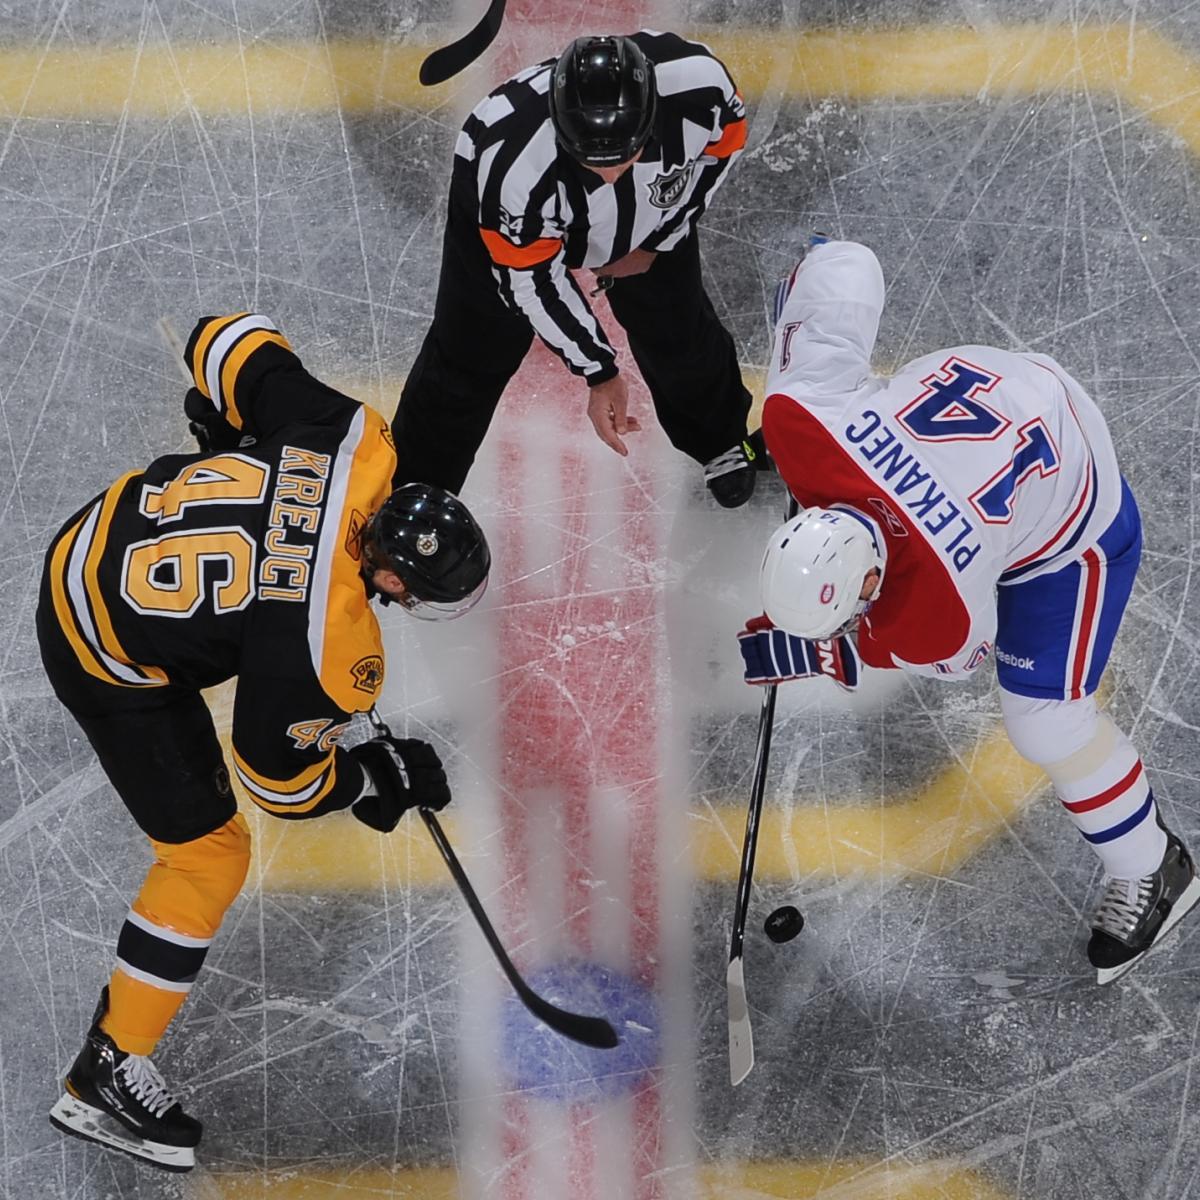 Montreal Canadiens Vs. Boston Bruins Game 7: Keys For Each